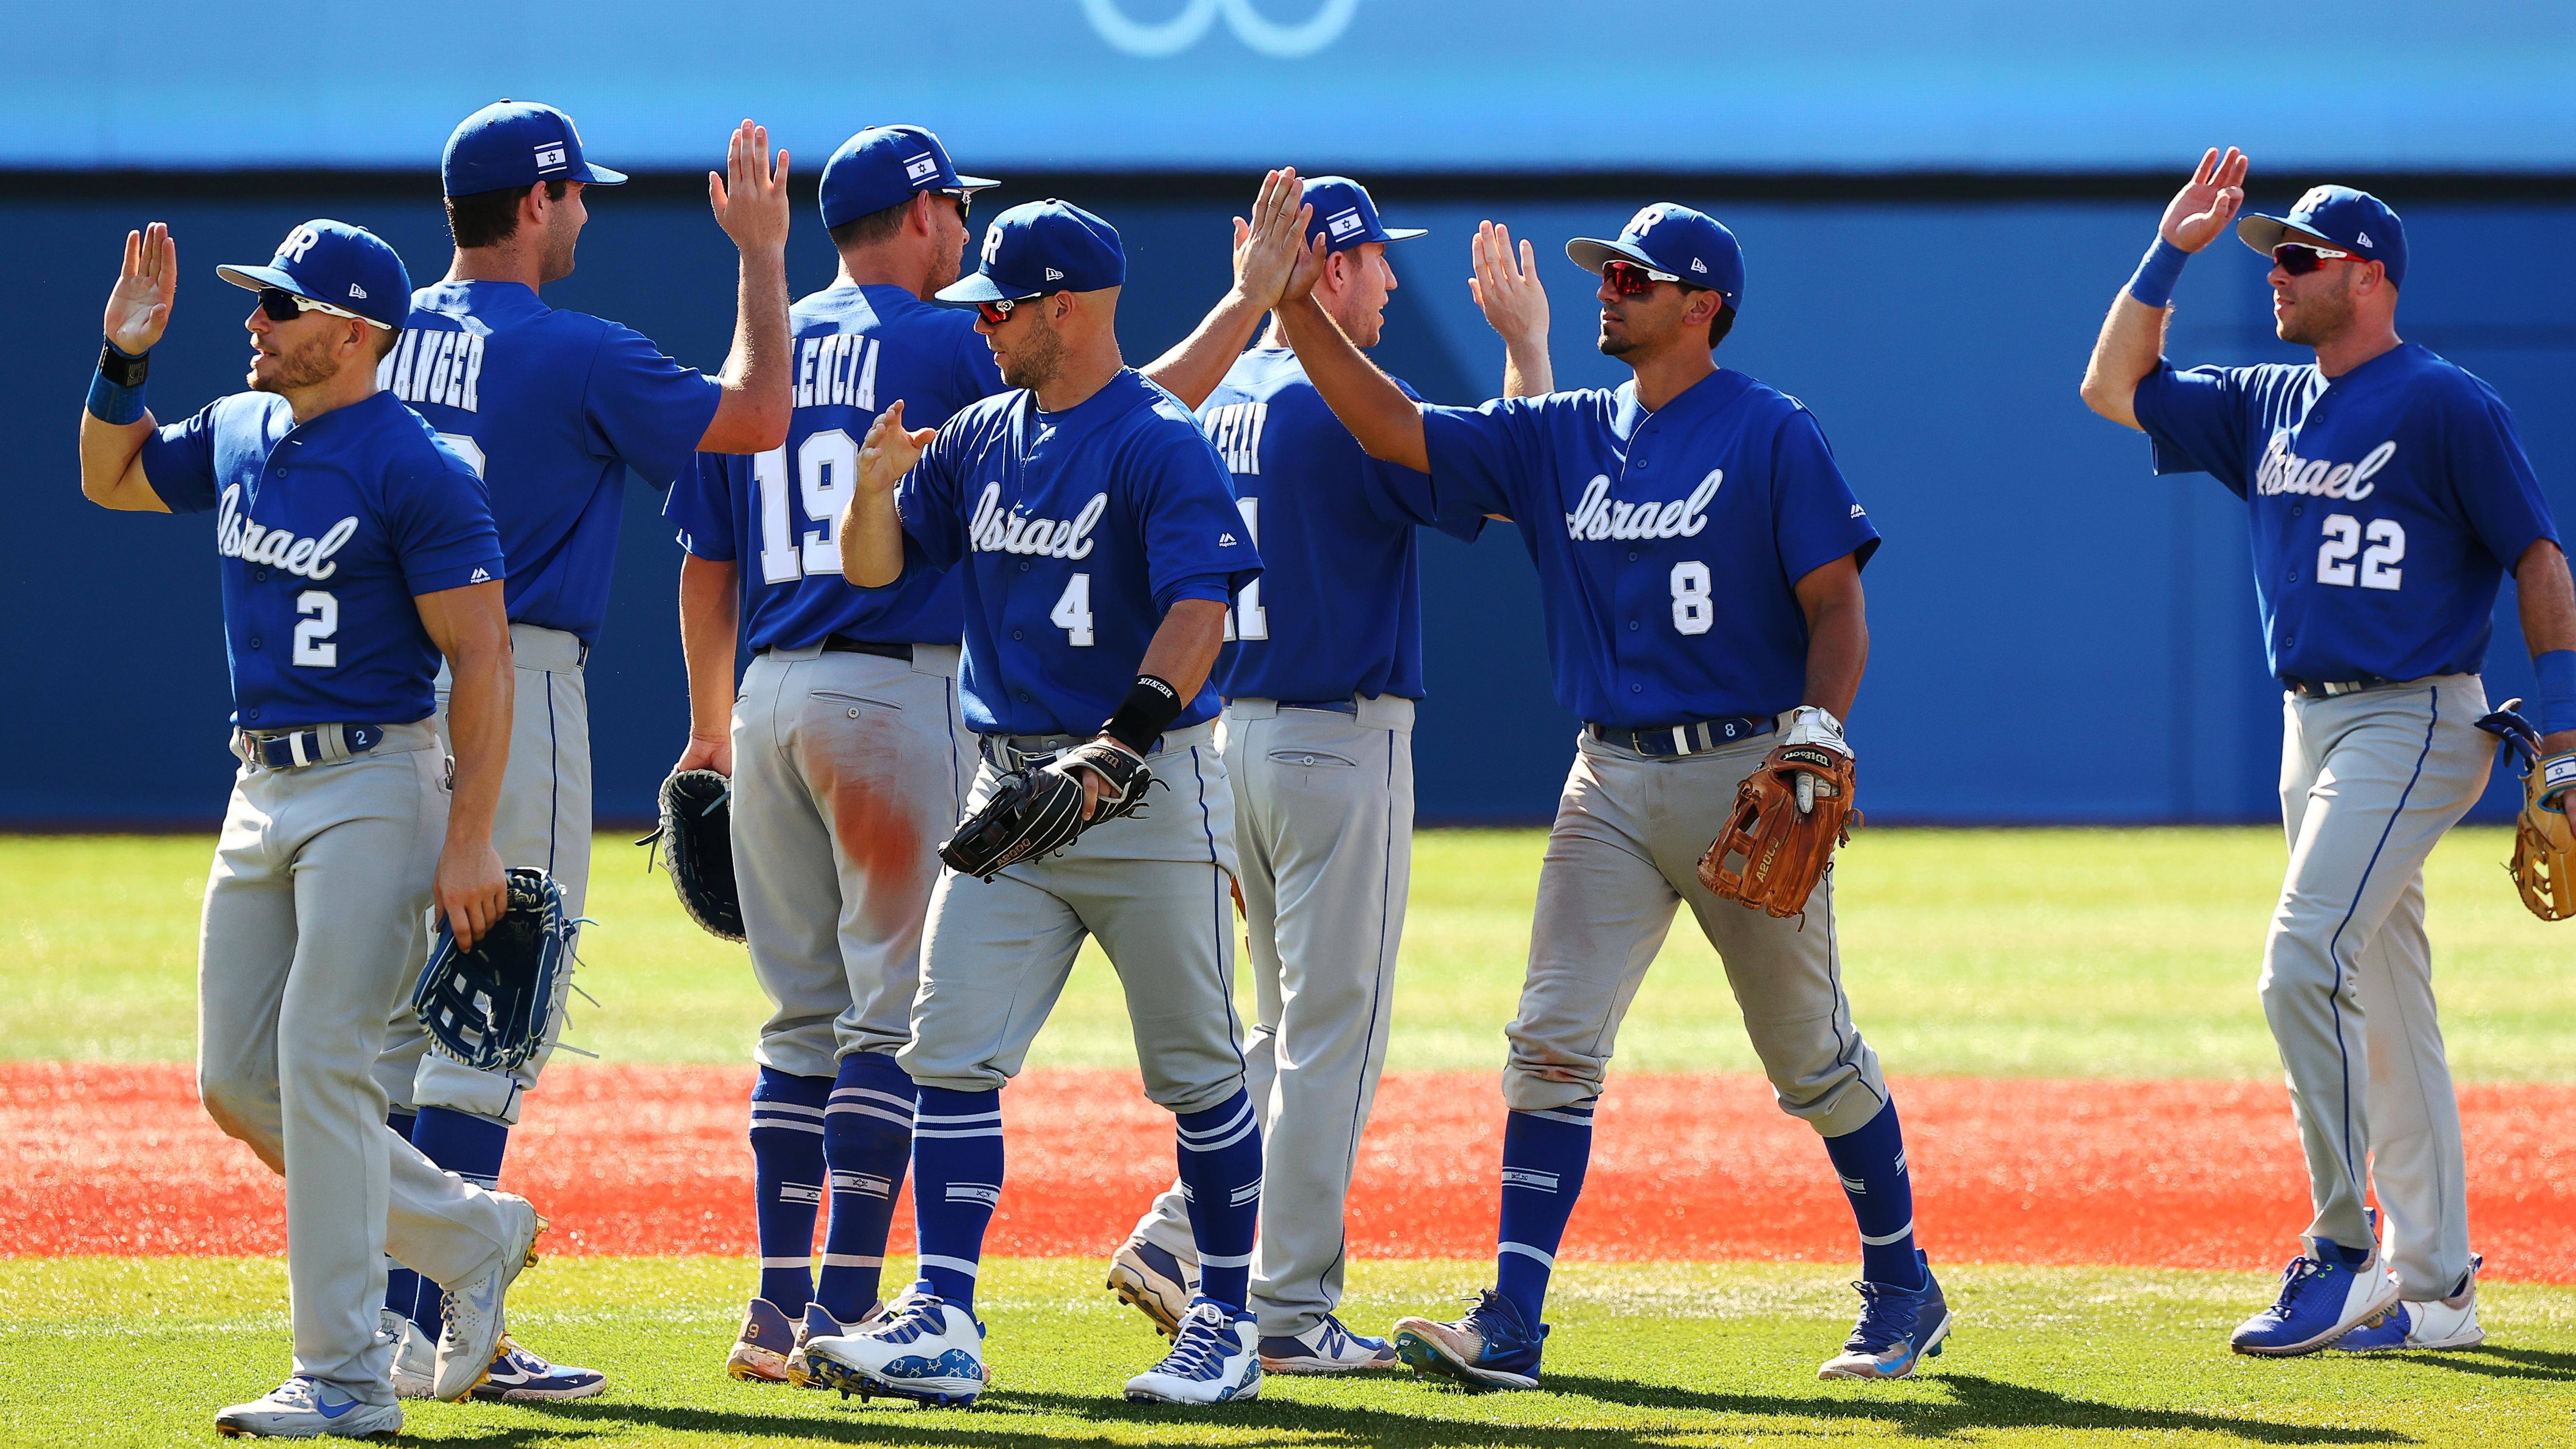 Tokyo 2020 Olympics - Baseball - Men - Knockout Round 1 - Israel v Mexico - Yokohama Baseball Stadium, Yokohama, Japan - August 1, 2021. Israel players celebrate their win. REUTERS/Jorge Silva